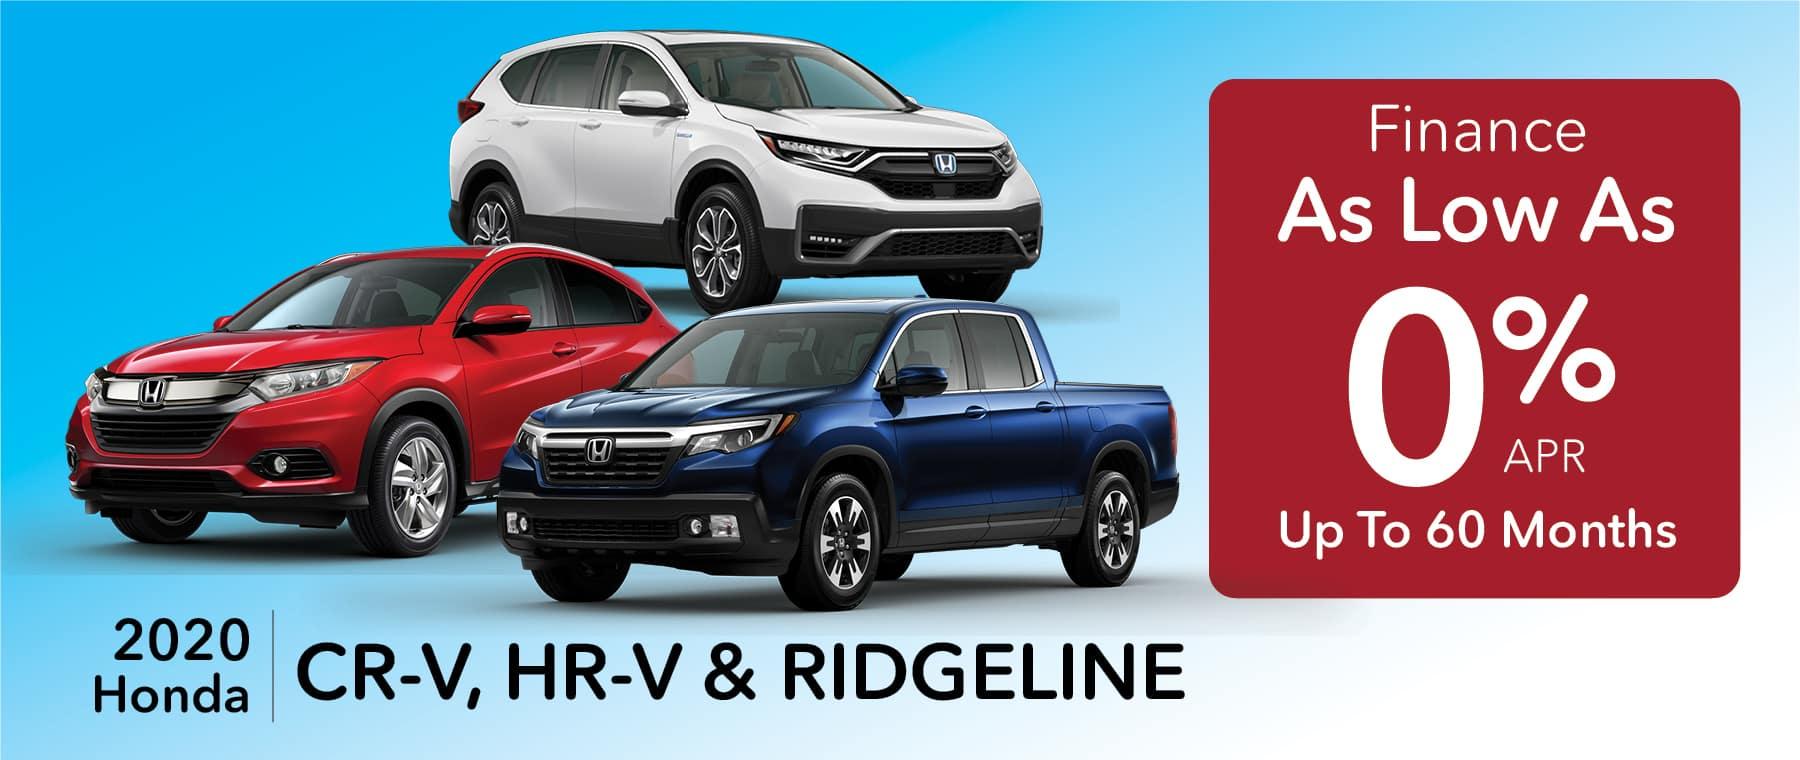 0% APR for up to 60 months CR-V HR-V Ridgeline at Smail Honda